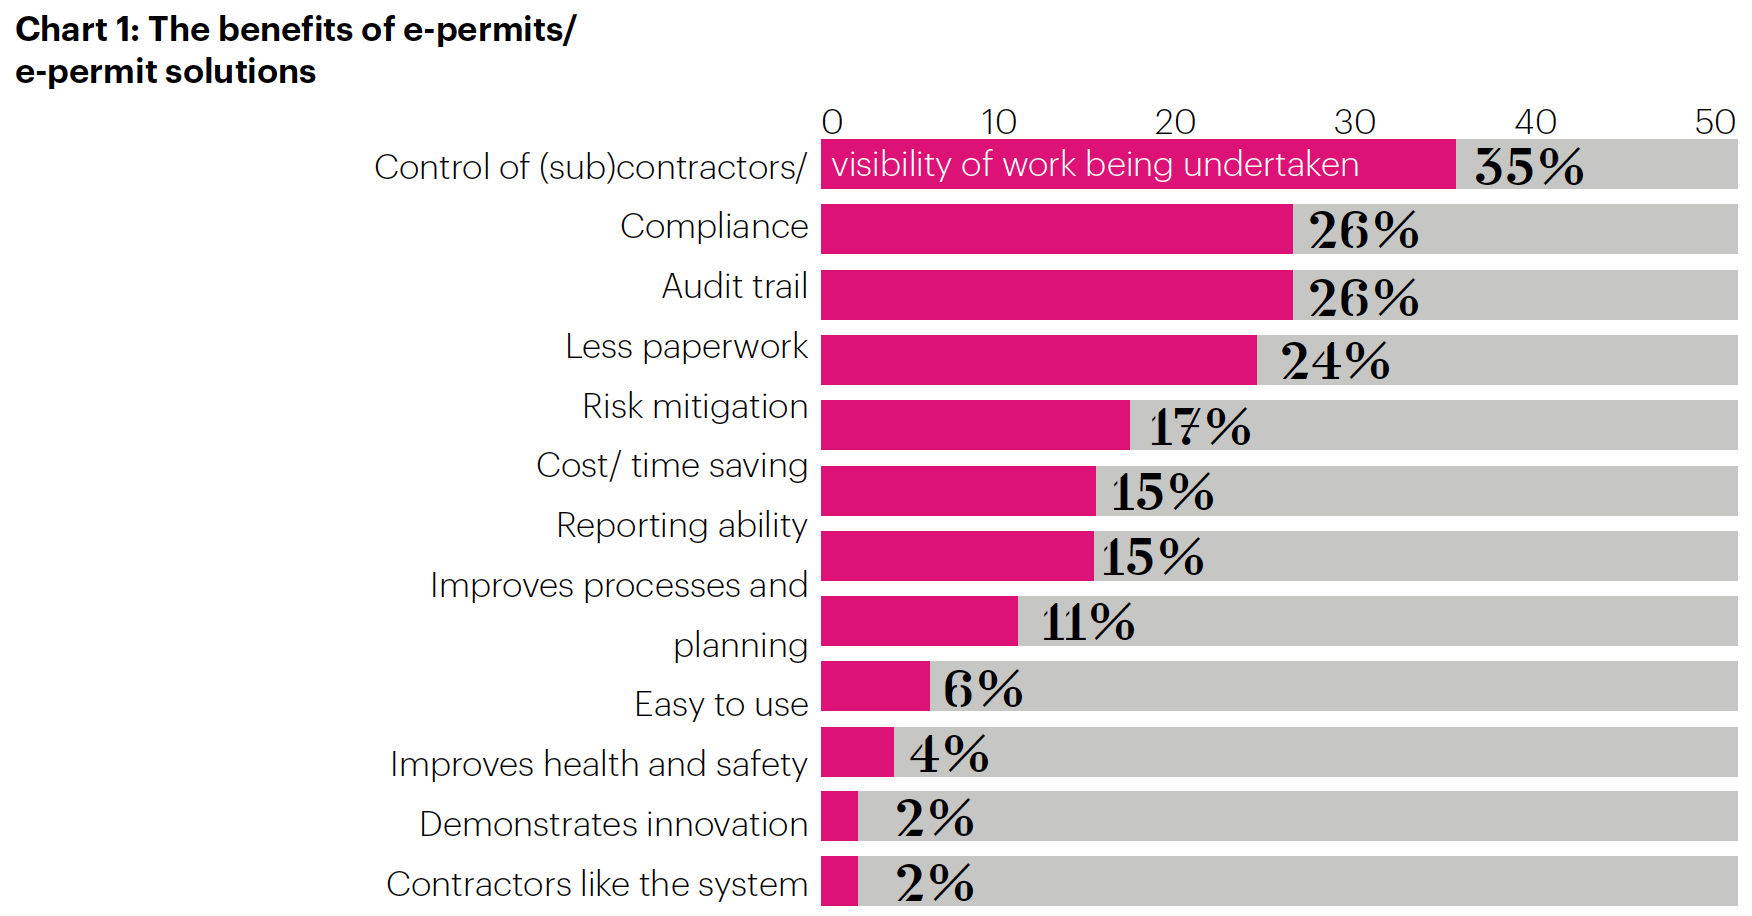 Benefits of e-permits